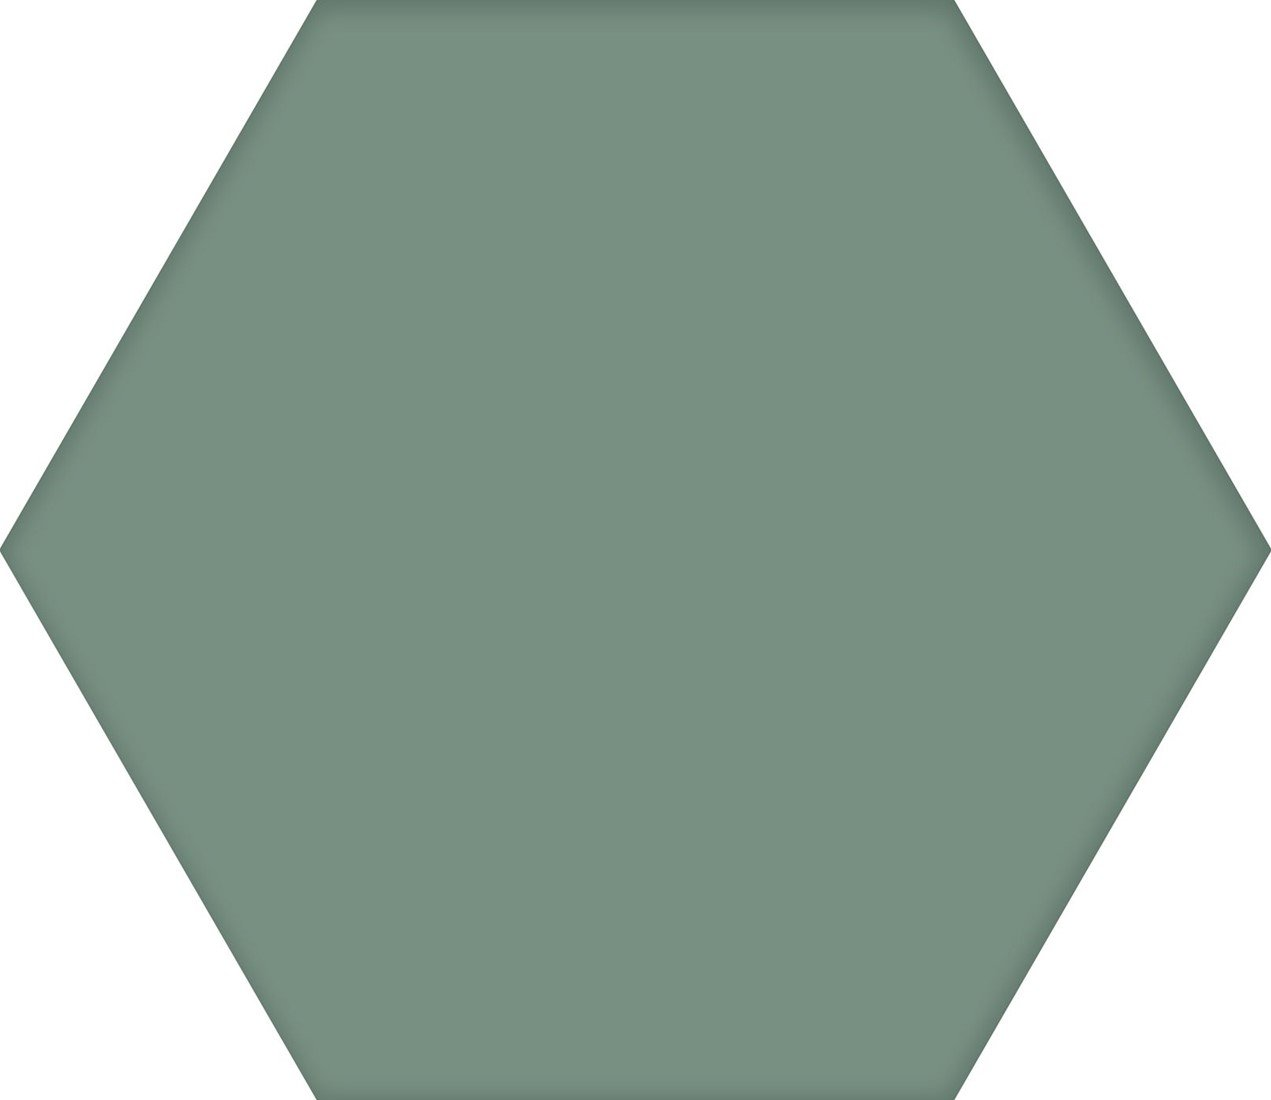 Codicer Hex25 Basic hexagon vloertegel 25x22 Kale